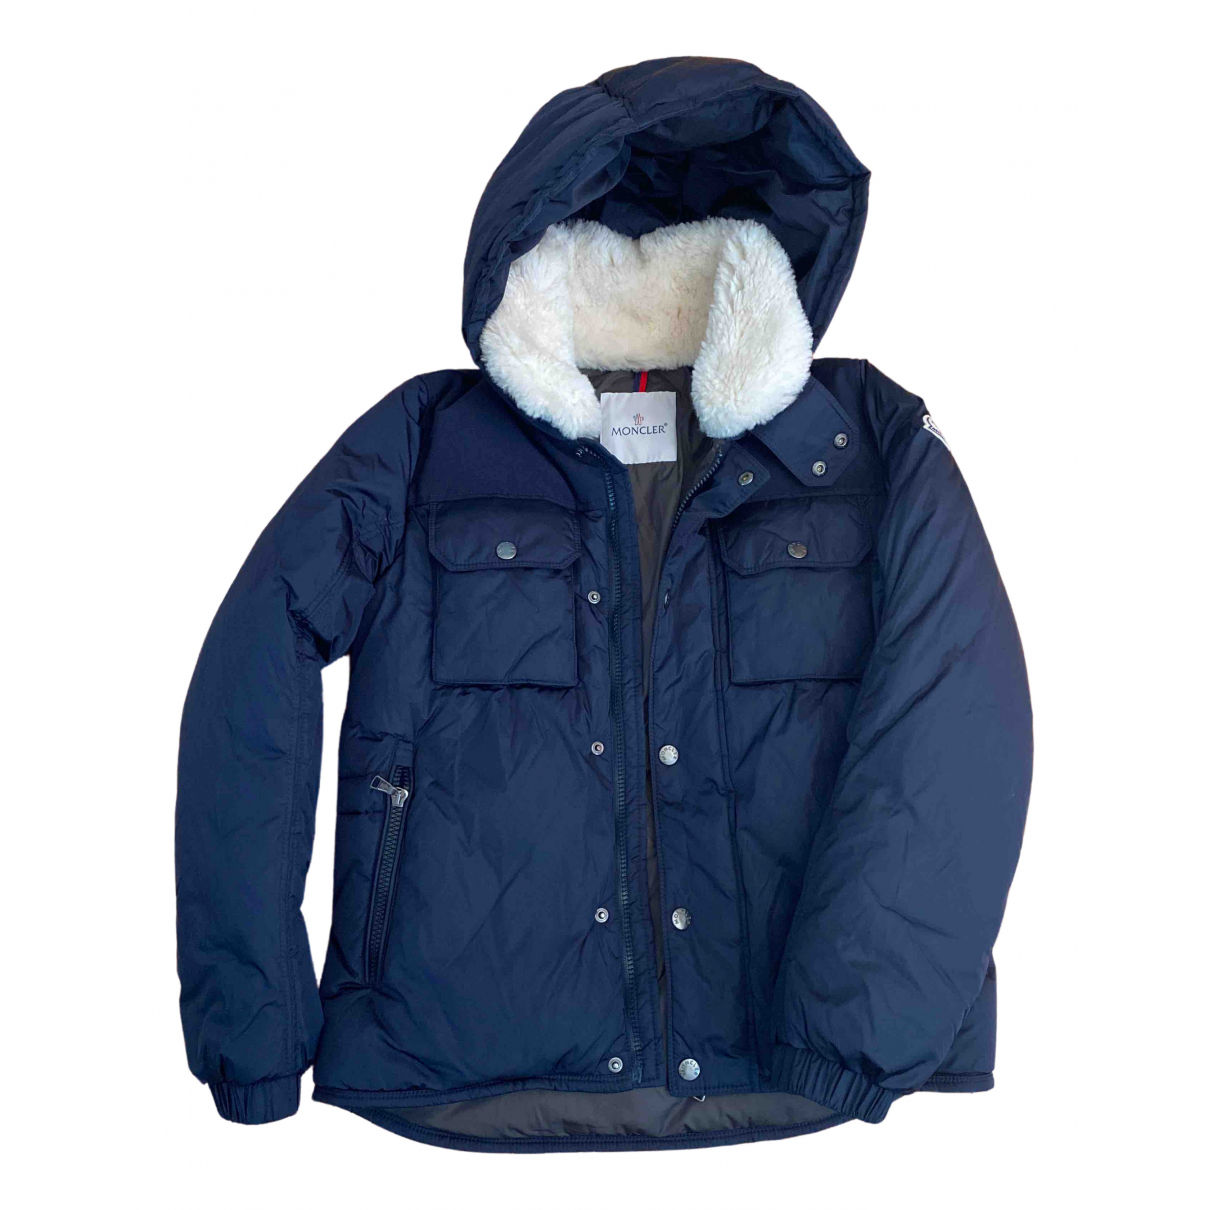 Moncler Fur Hood Navy jacket & coat for Kids 12 years - XS FR